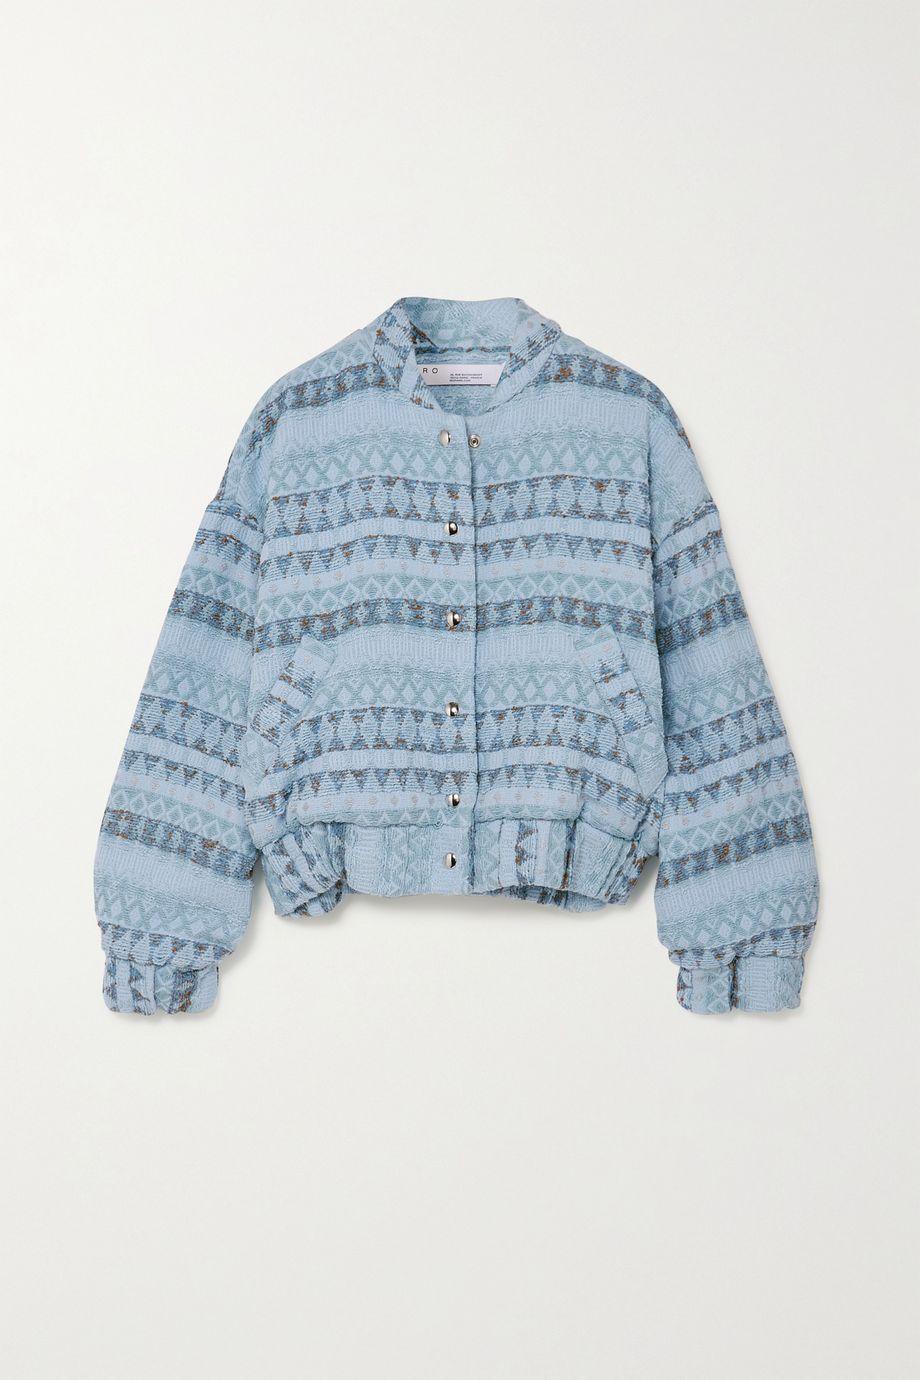 IRO Loupian padded textured cotton-blend bomber jacket